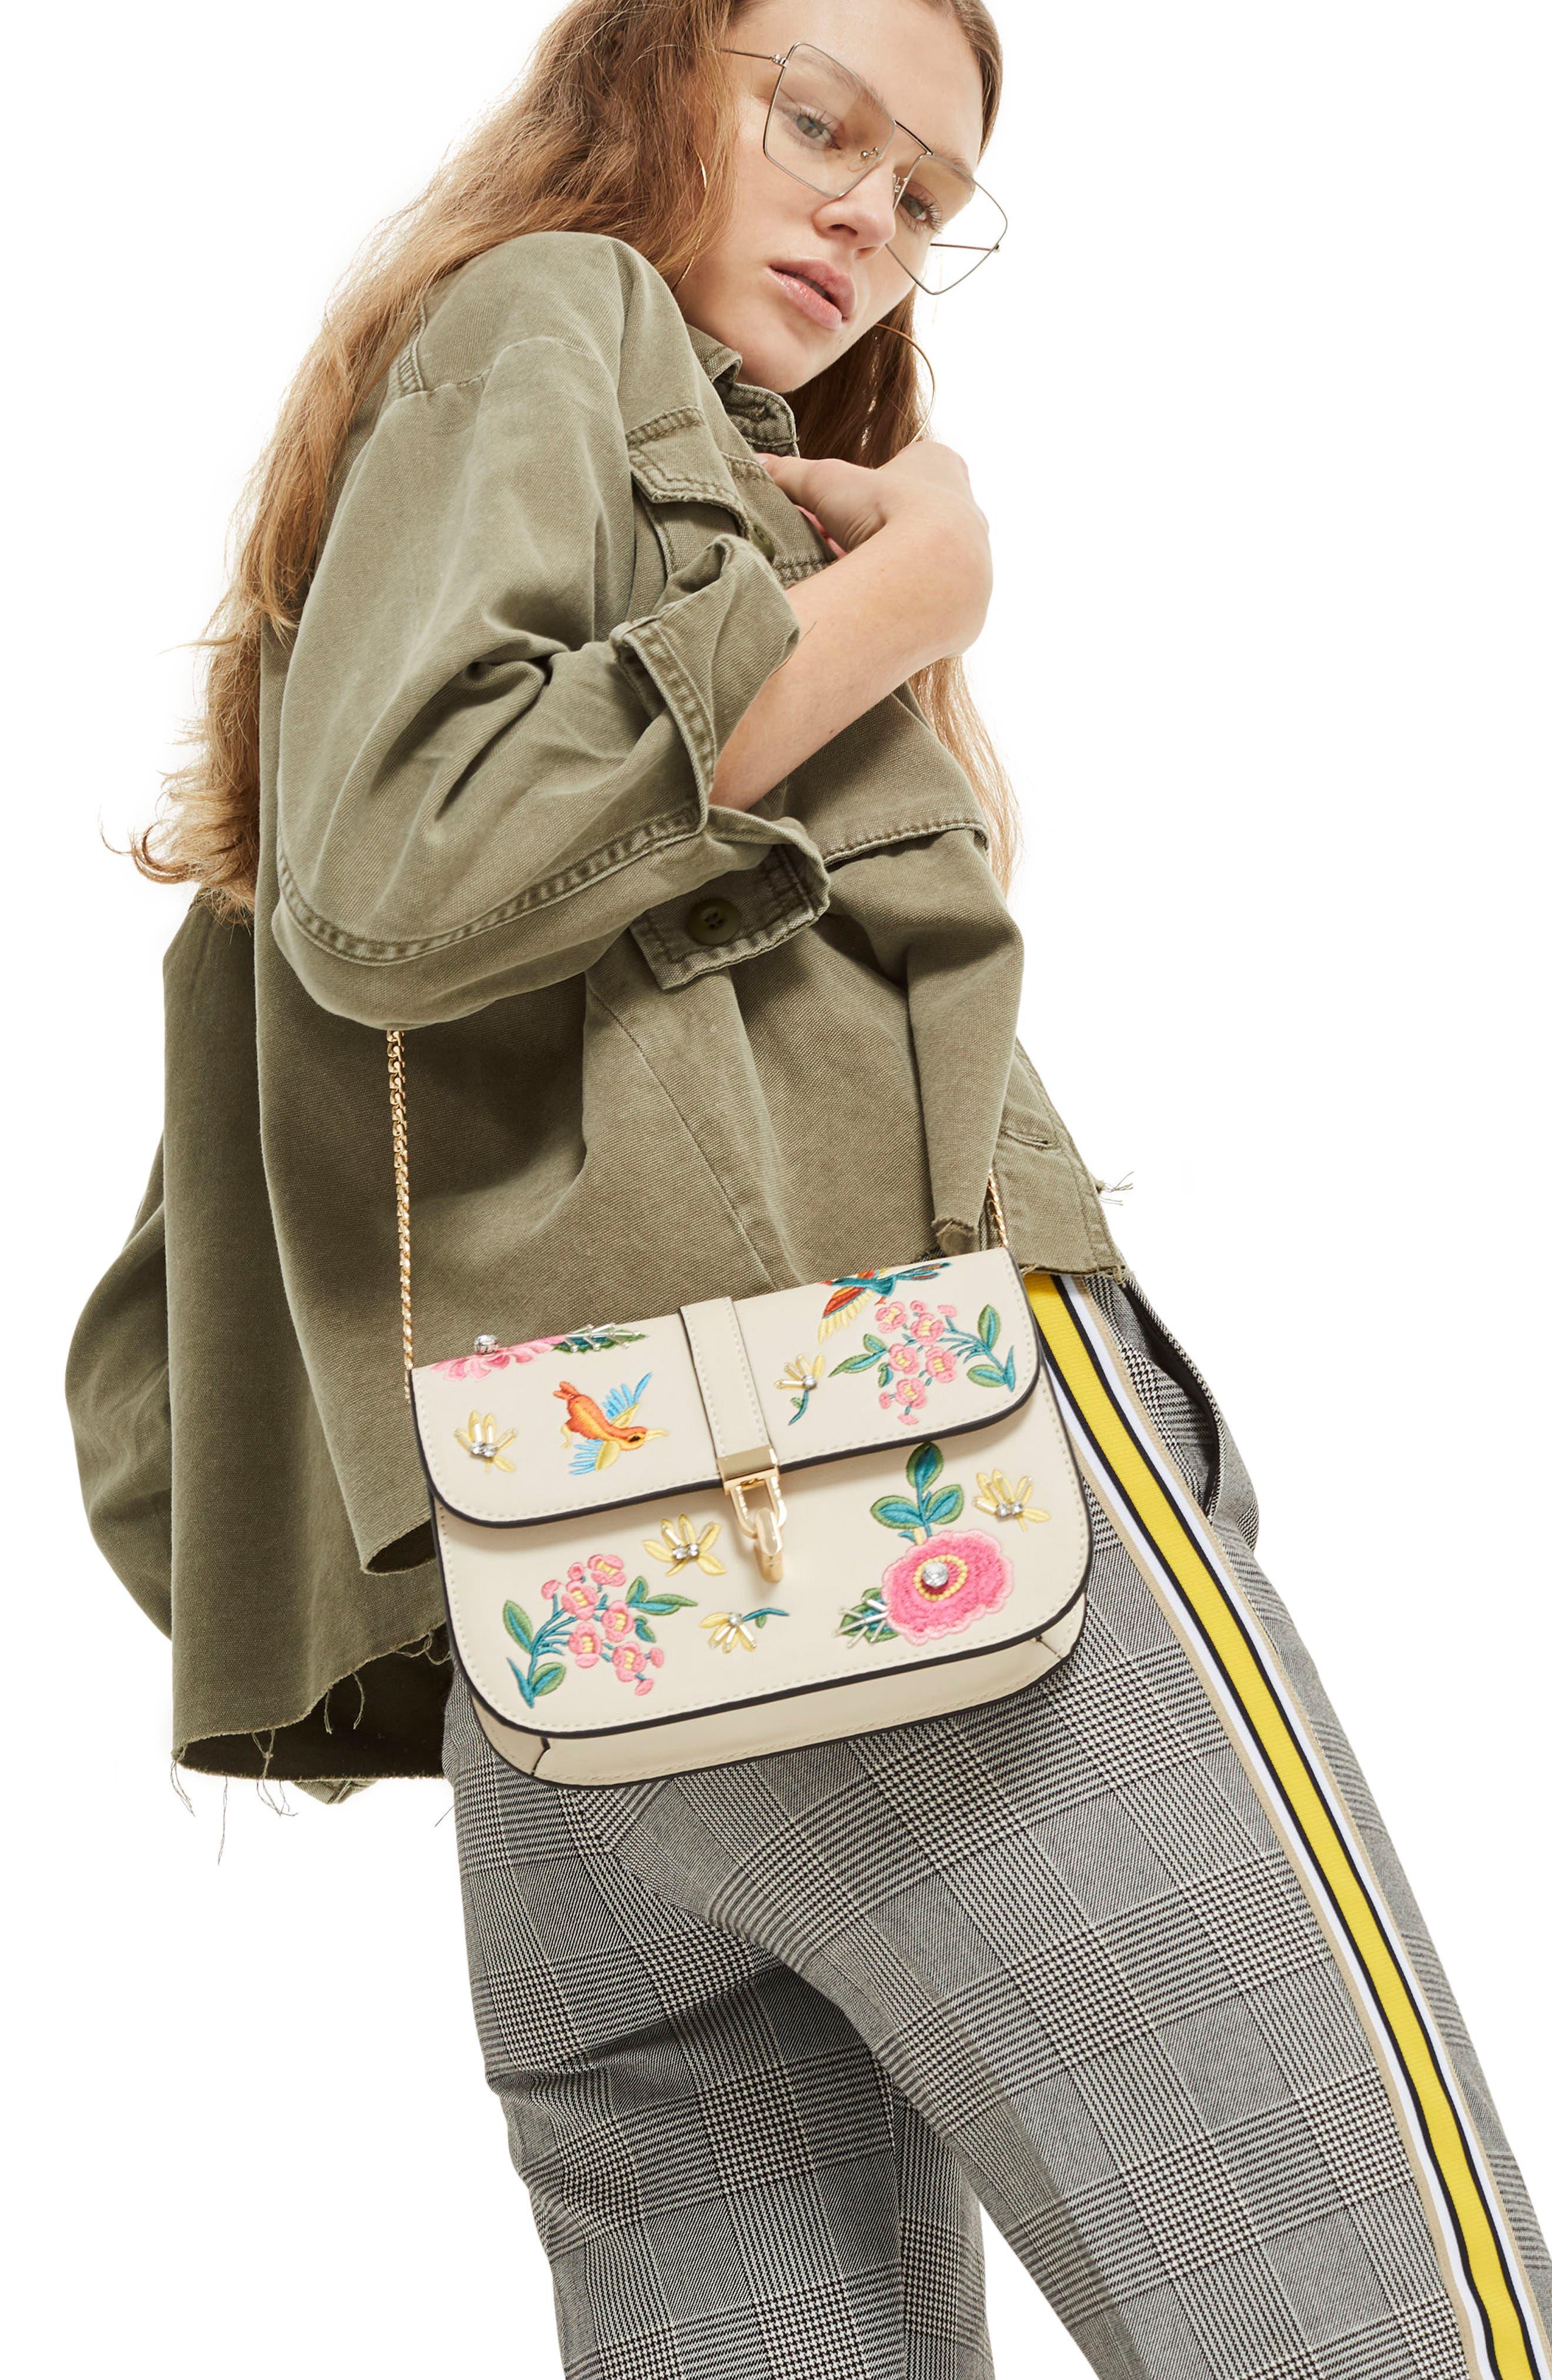 Hummingbird Embroidered Crossbody Bag,                             Alternate thumbnail 2, color,                             Cream Multi